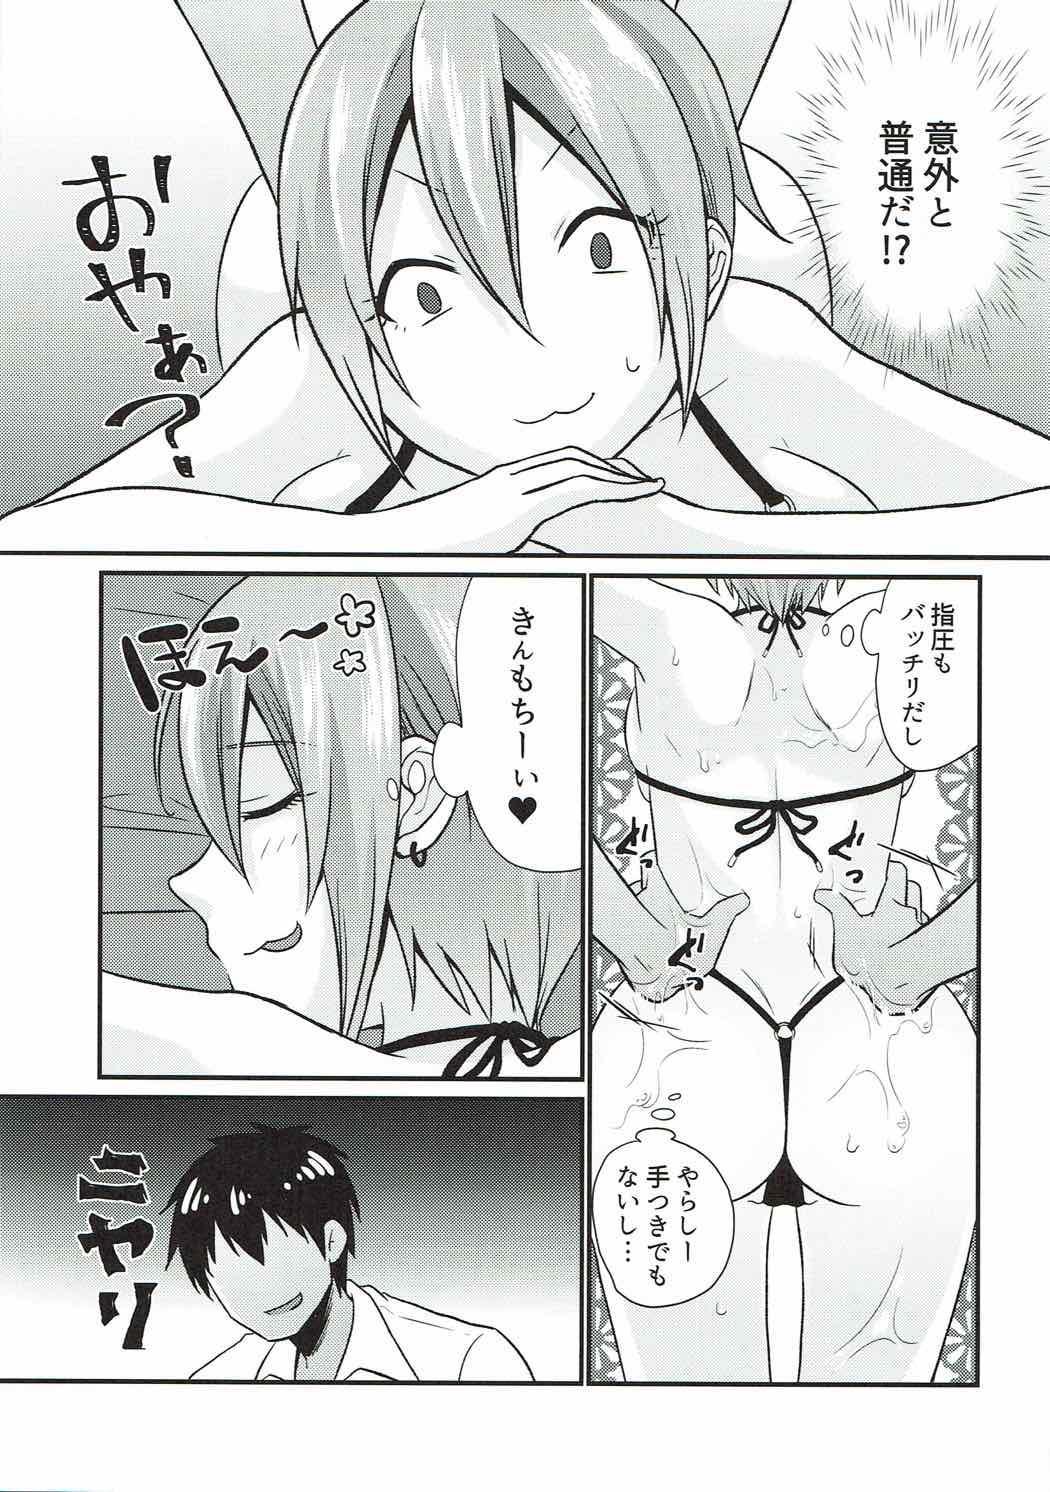 Syuko to Nurunuru Ichaicha Massage 7